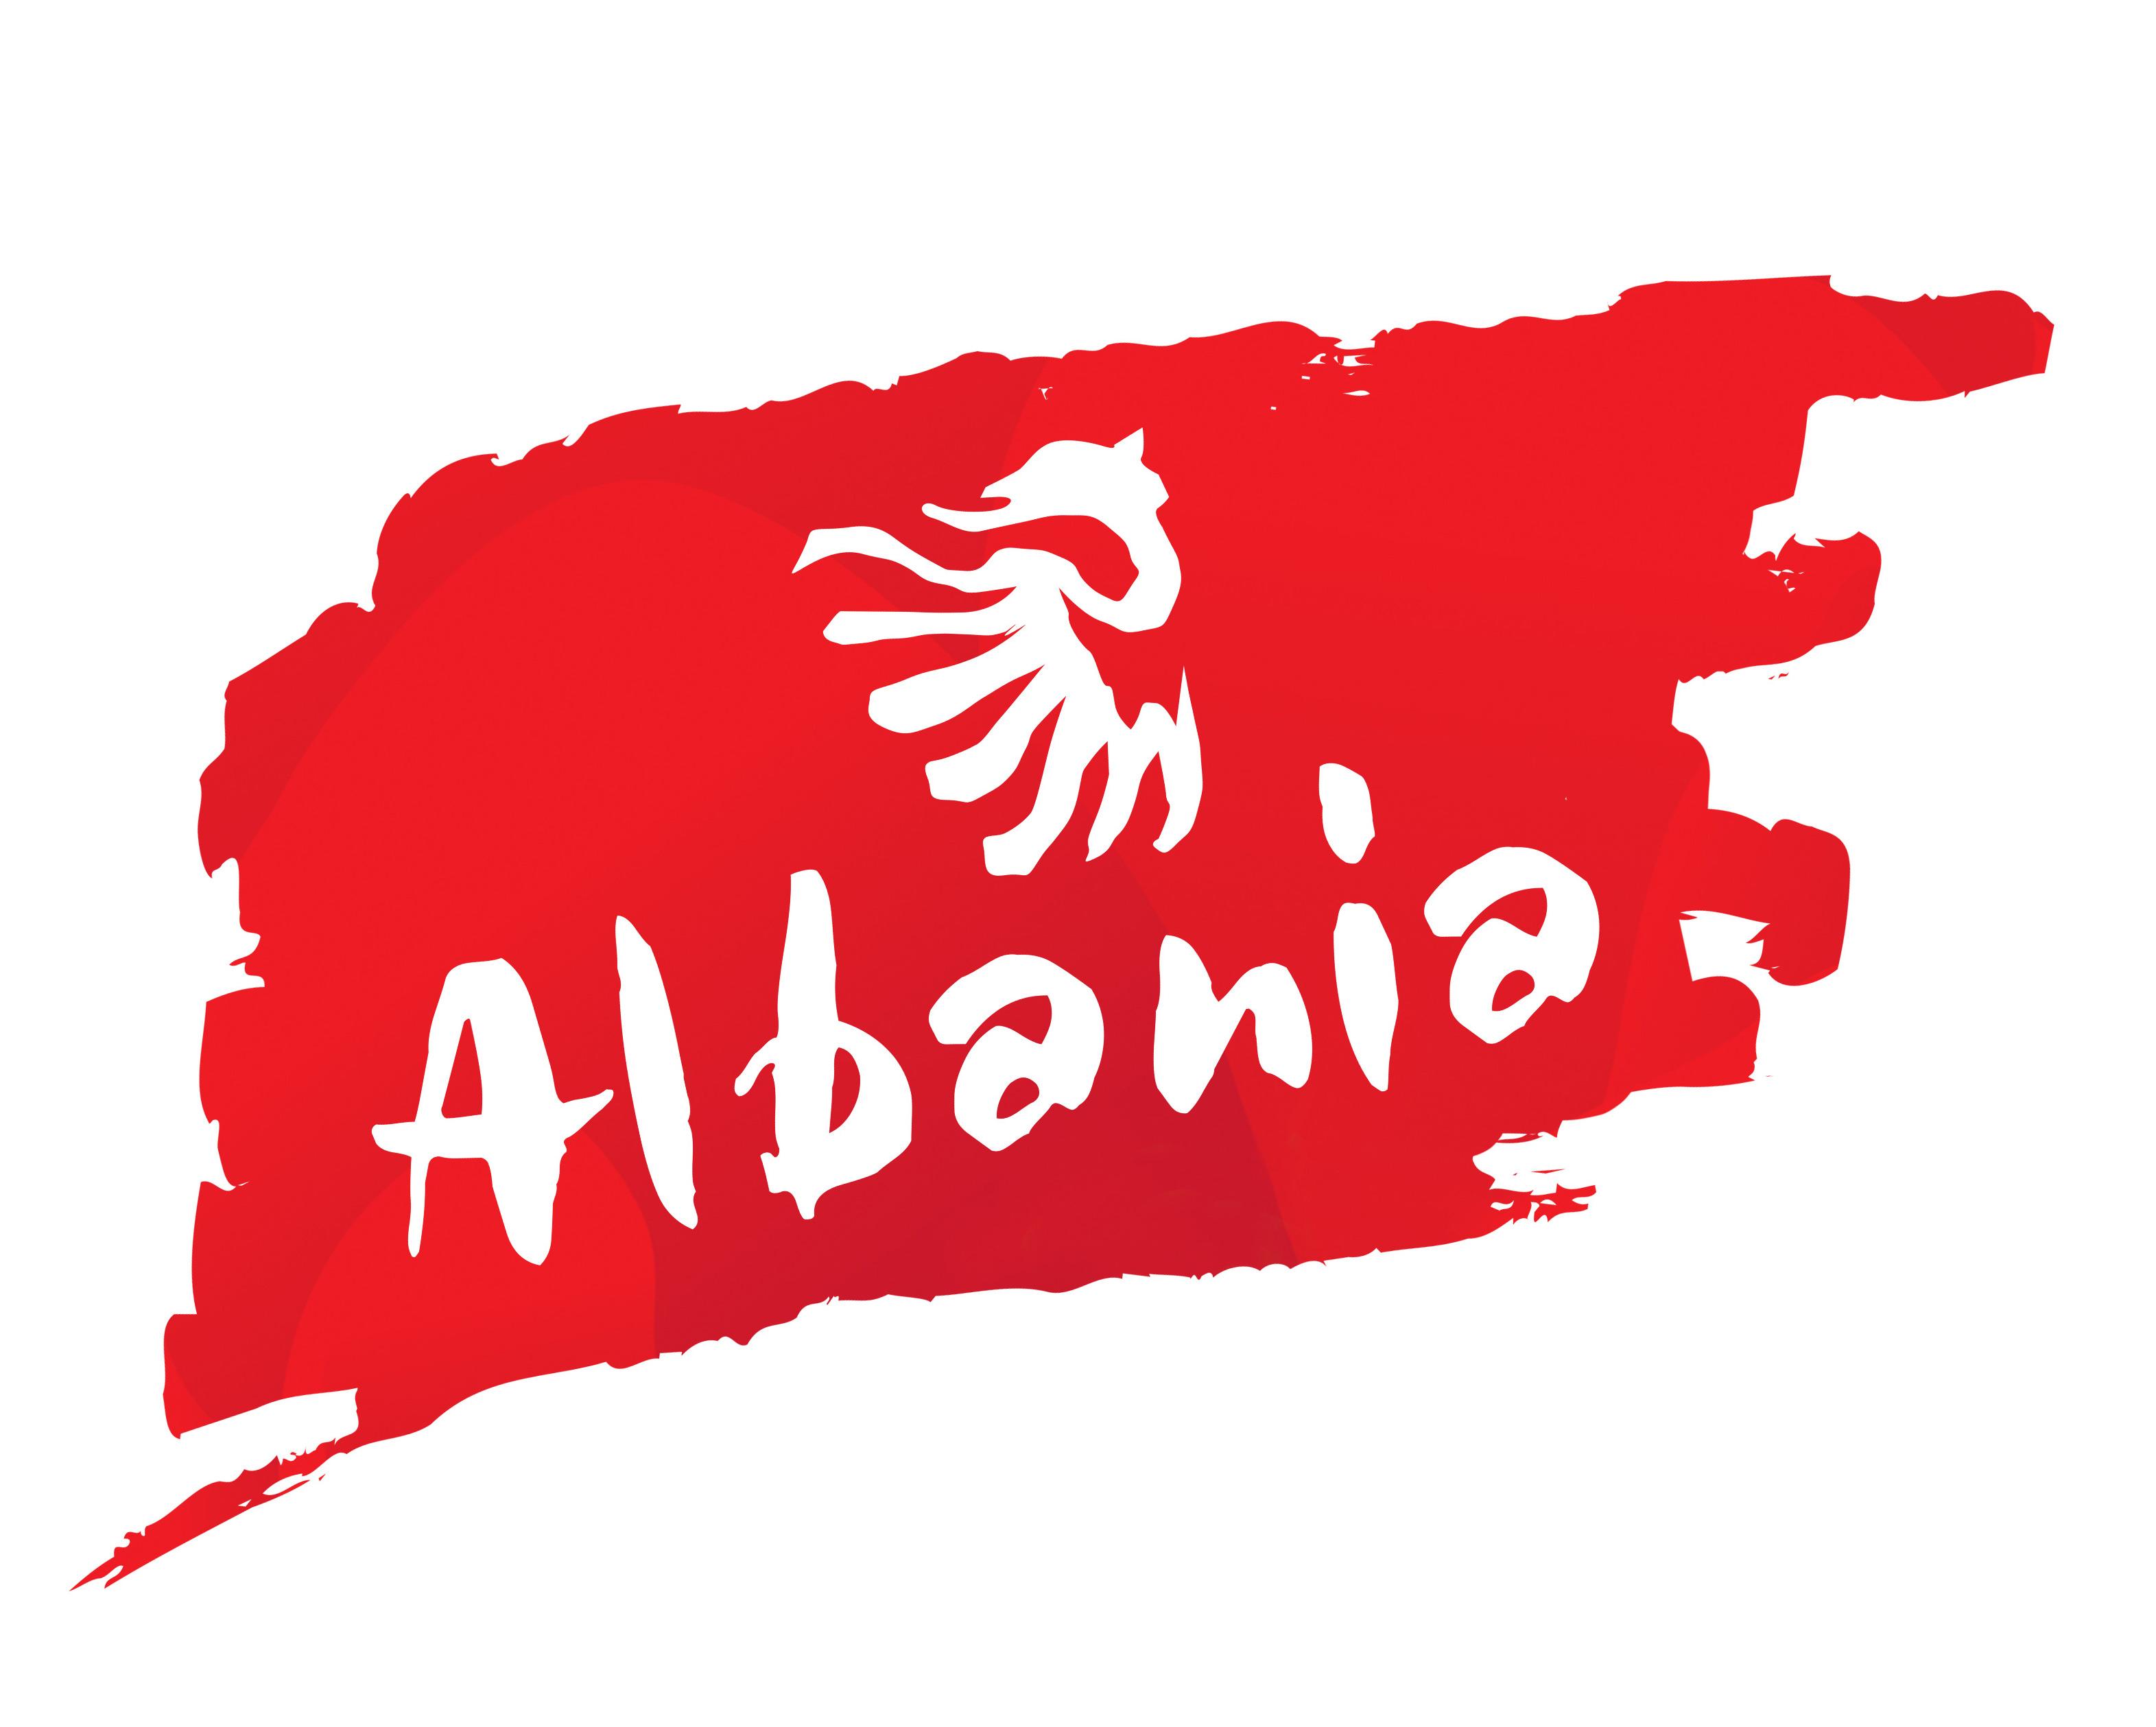 ALBANIA_HEADER_B